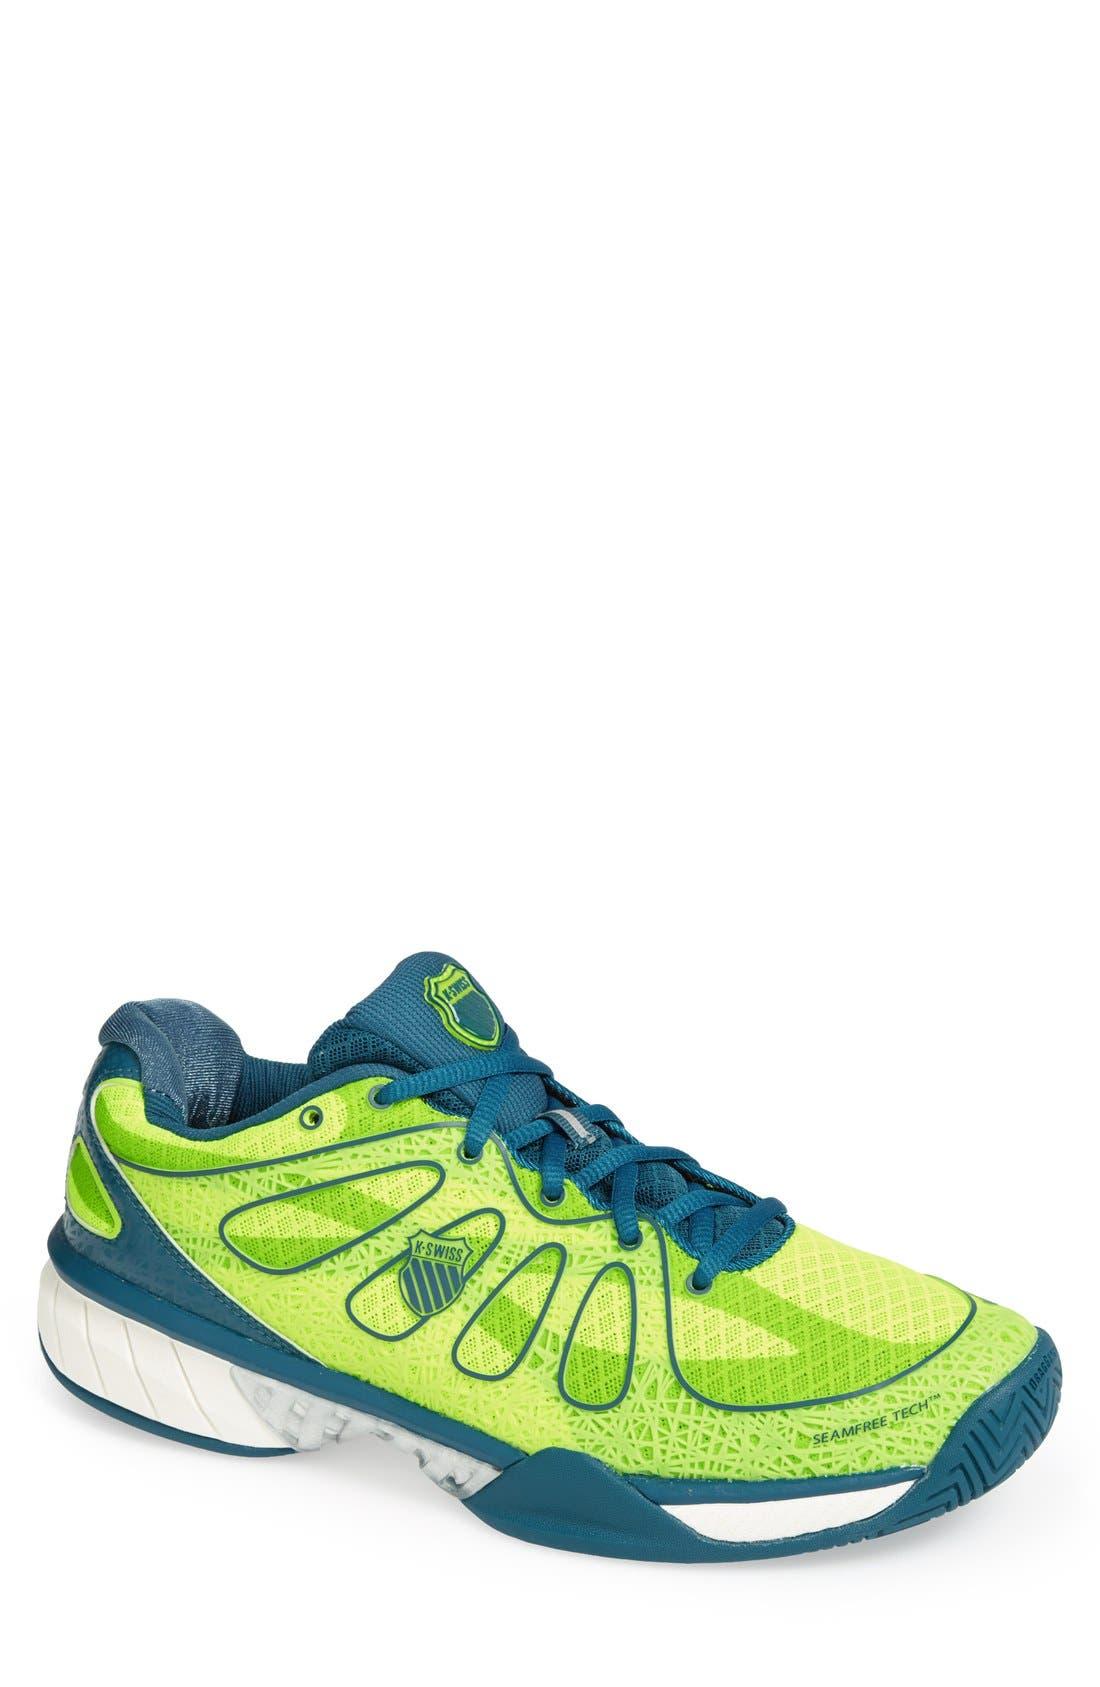 Main Image - K-Swiss 'Ultra Express' Tennis Shoe (Men)